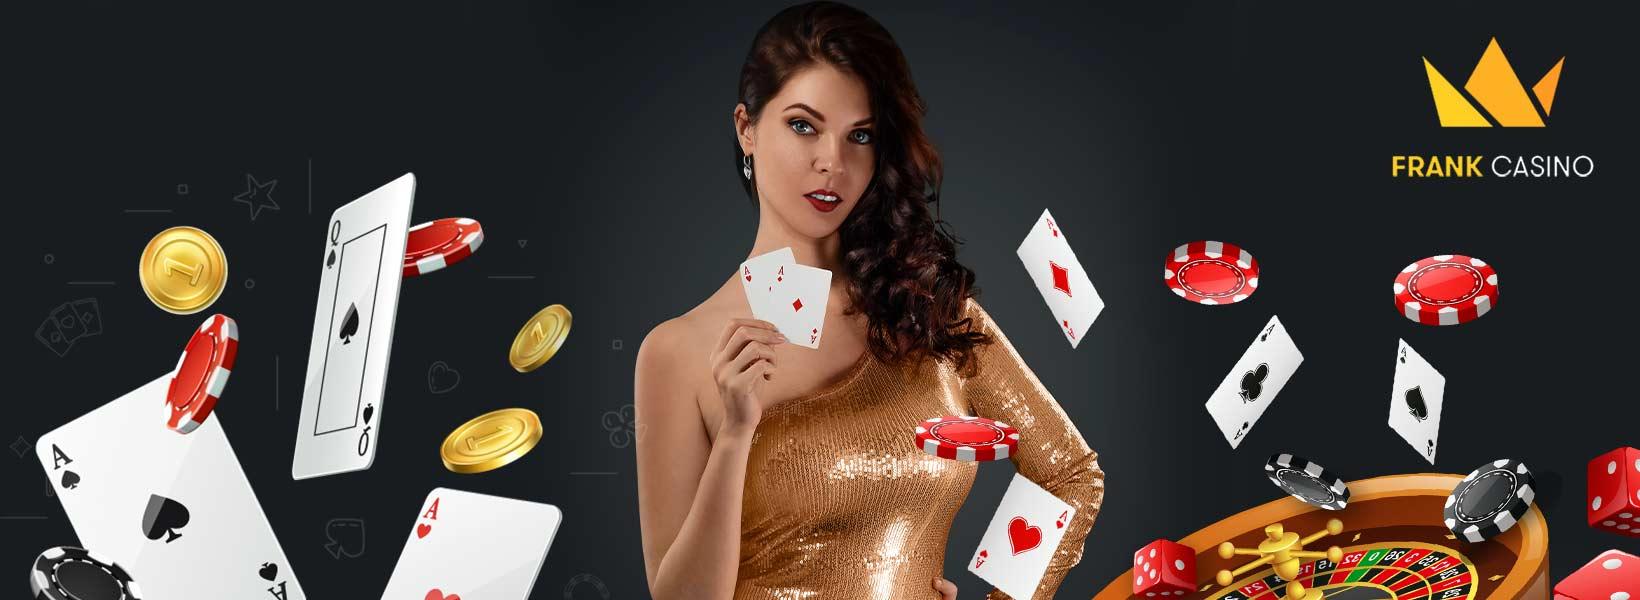 frank casino live